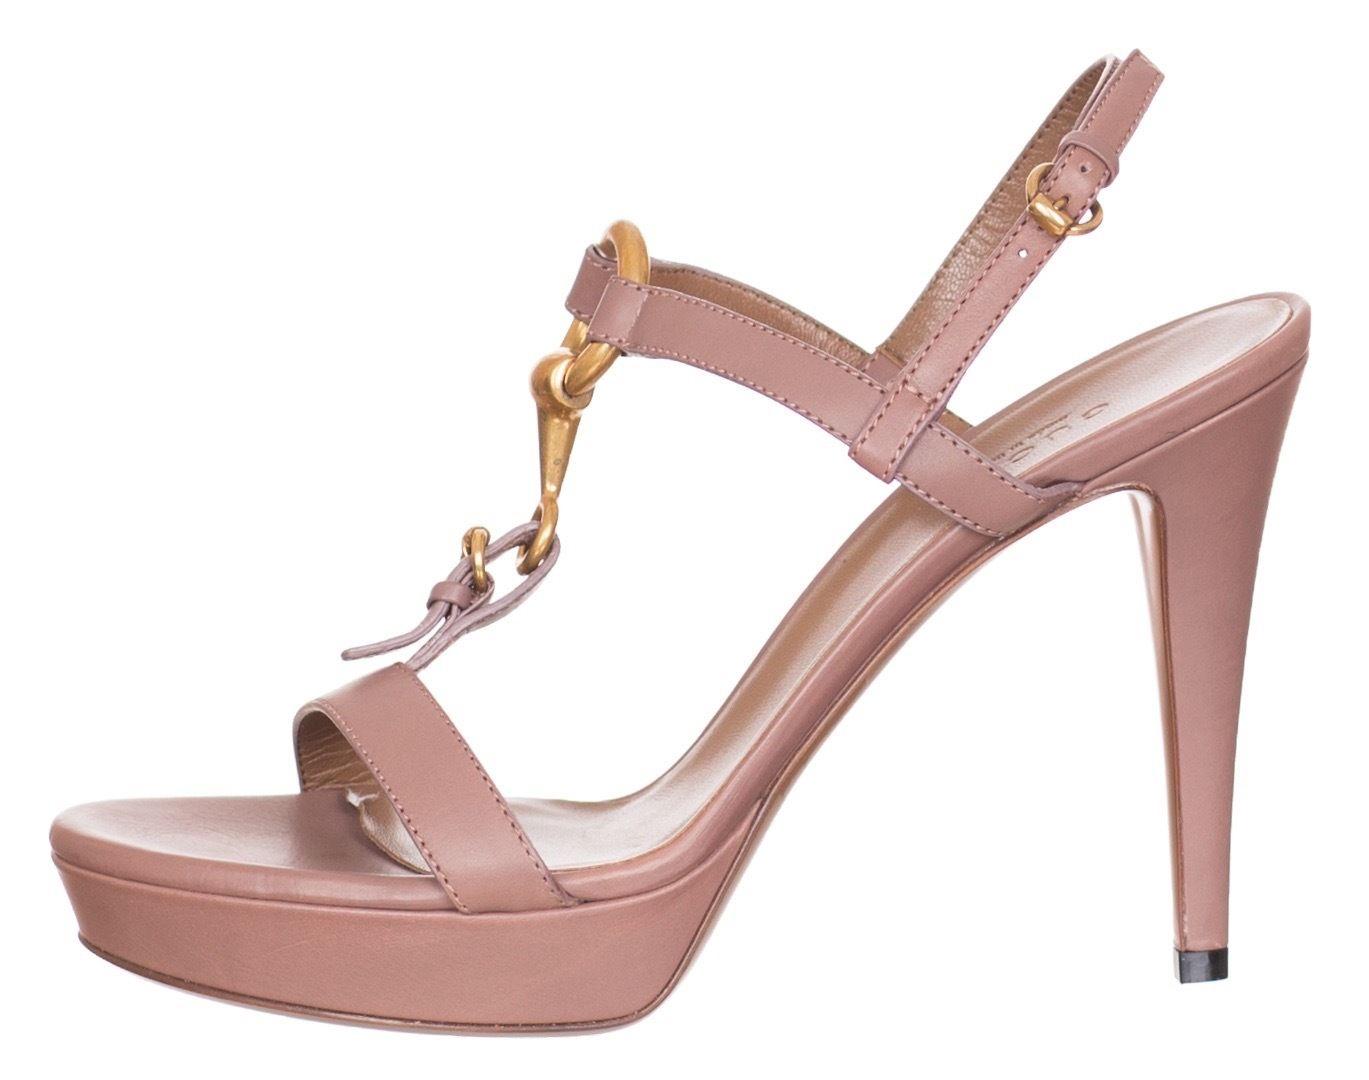 68546f7aeb76  695 Gucci Pink Horsebit Leather Platform Sandals Heels Shoes US 7.5 ...